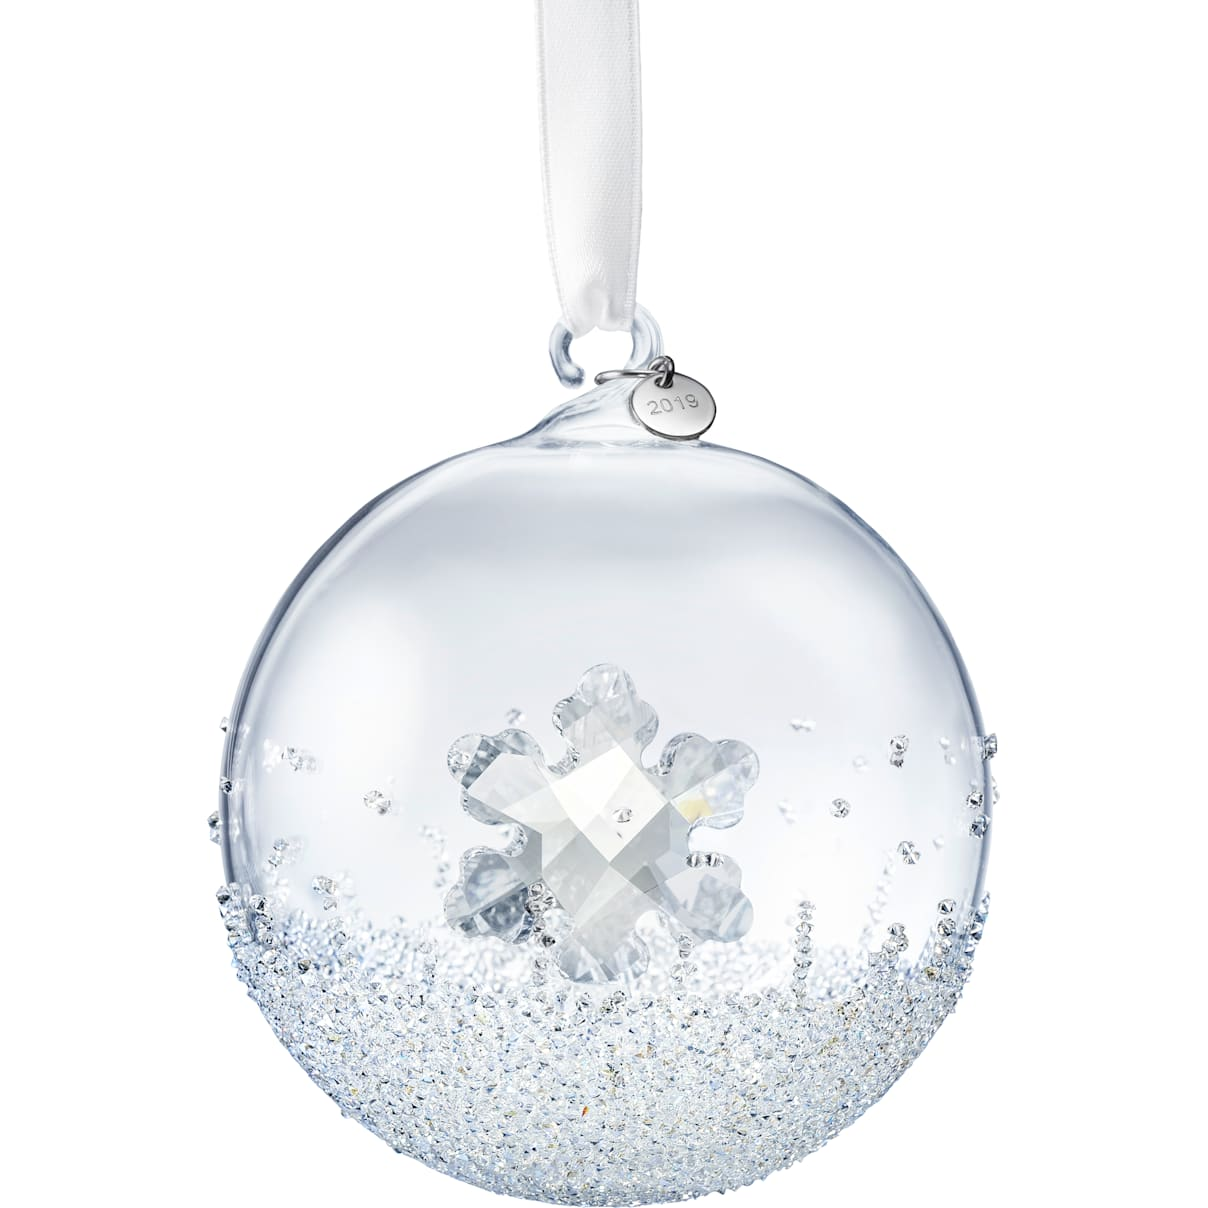 Swarovski Christmas Ball Ornament, A.E. 2019